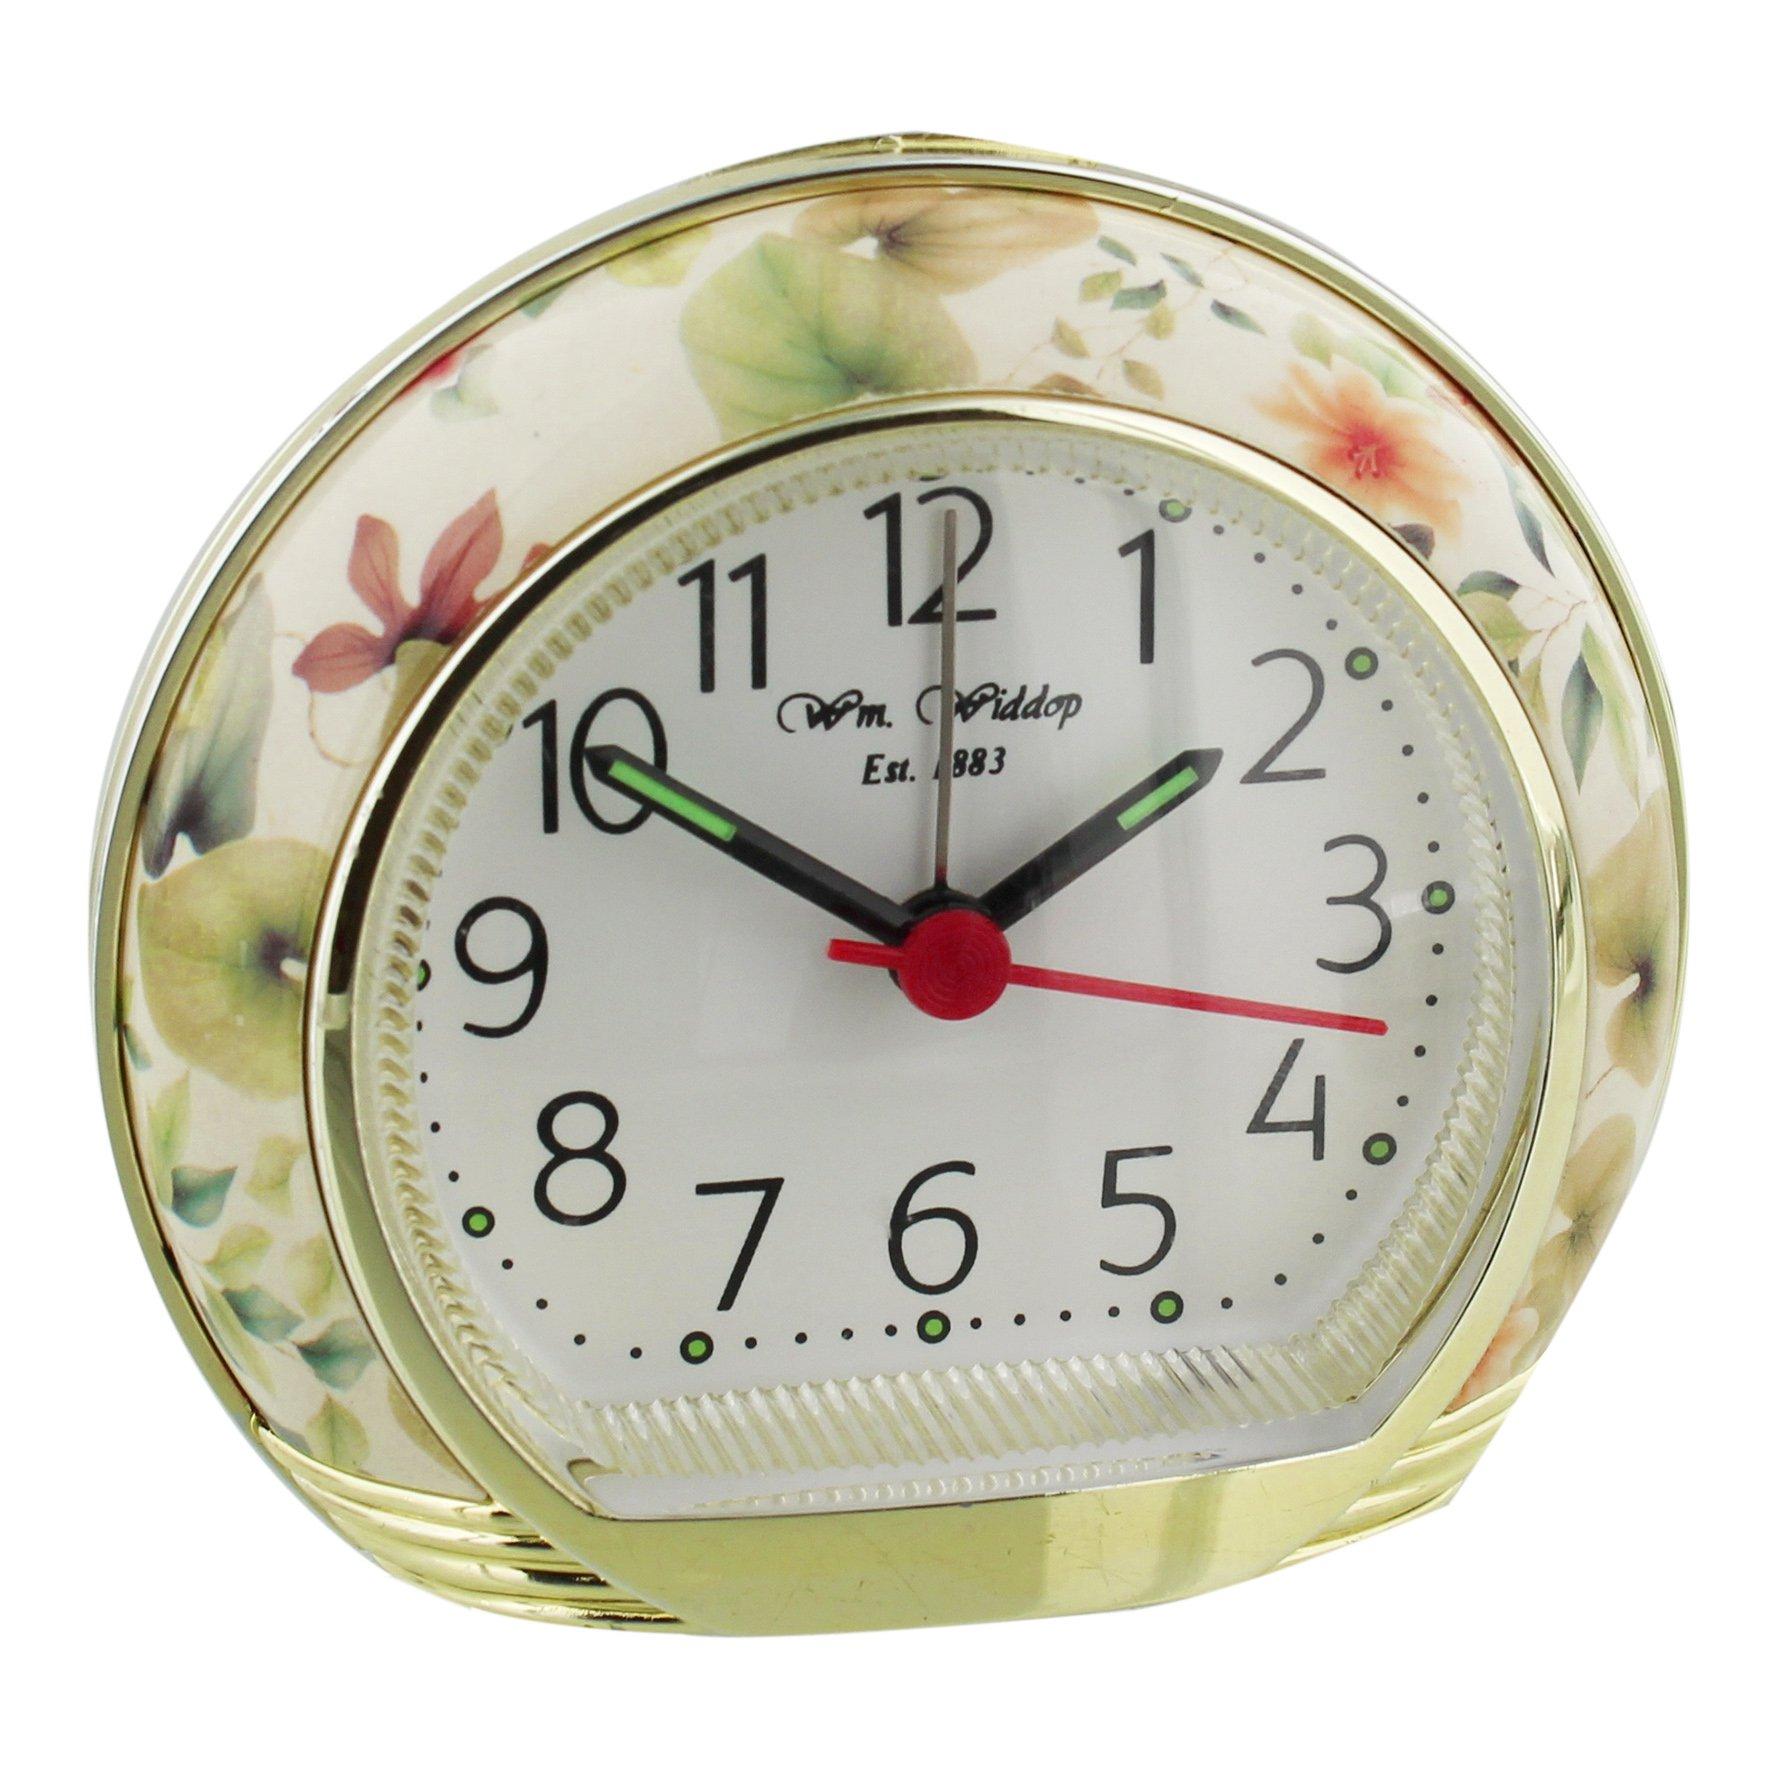 Widdop Flower Design Alarm Clock Widdop Alarm Clocks